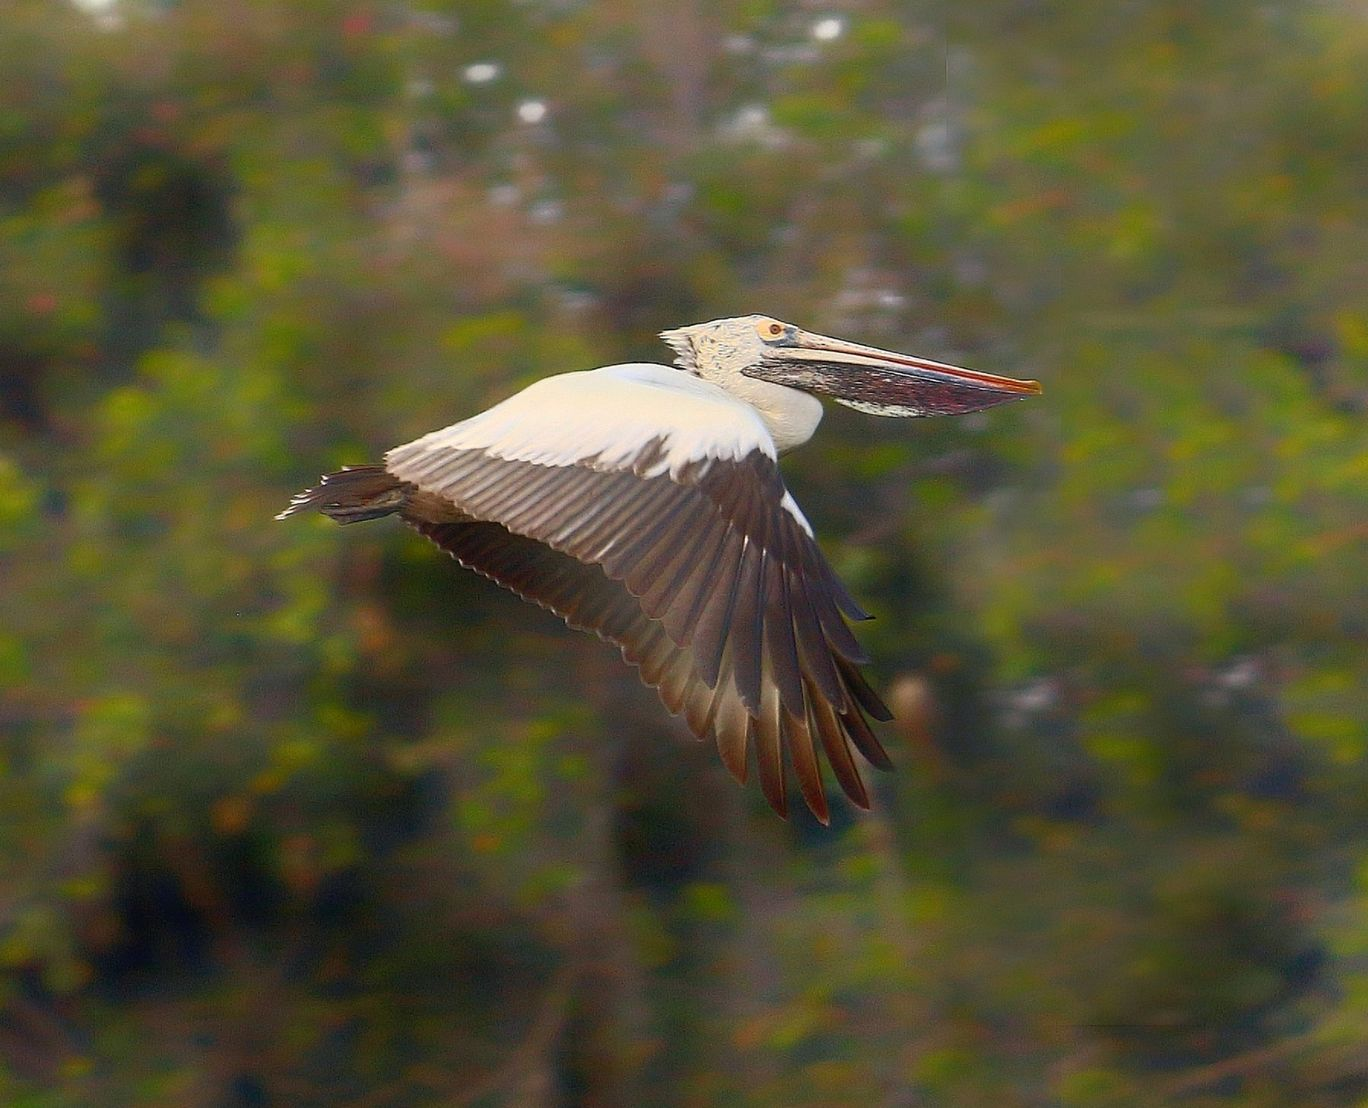 Photo of Ranganathittu Bird Sanctuary By Prema reddy